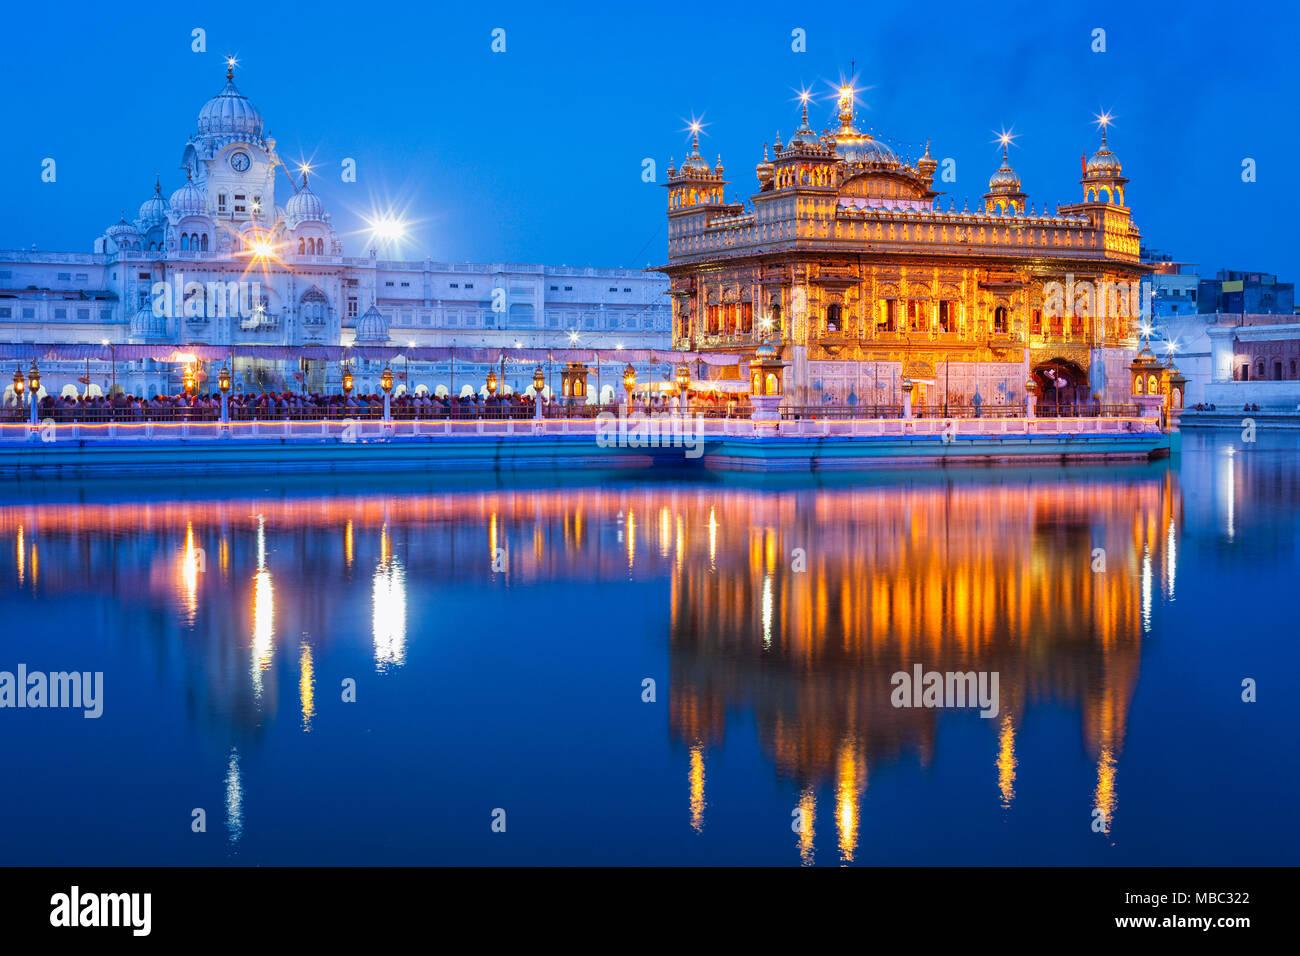 Golden Temple Amritsar Stock Photo 179130730 Alamy